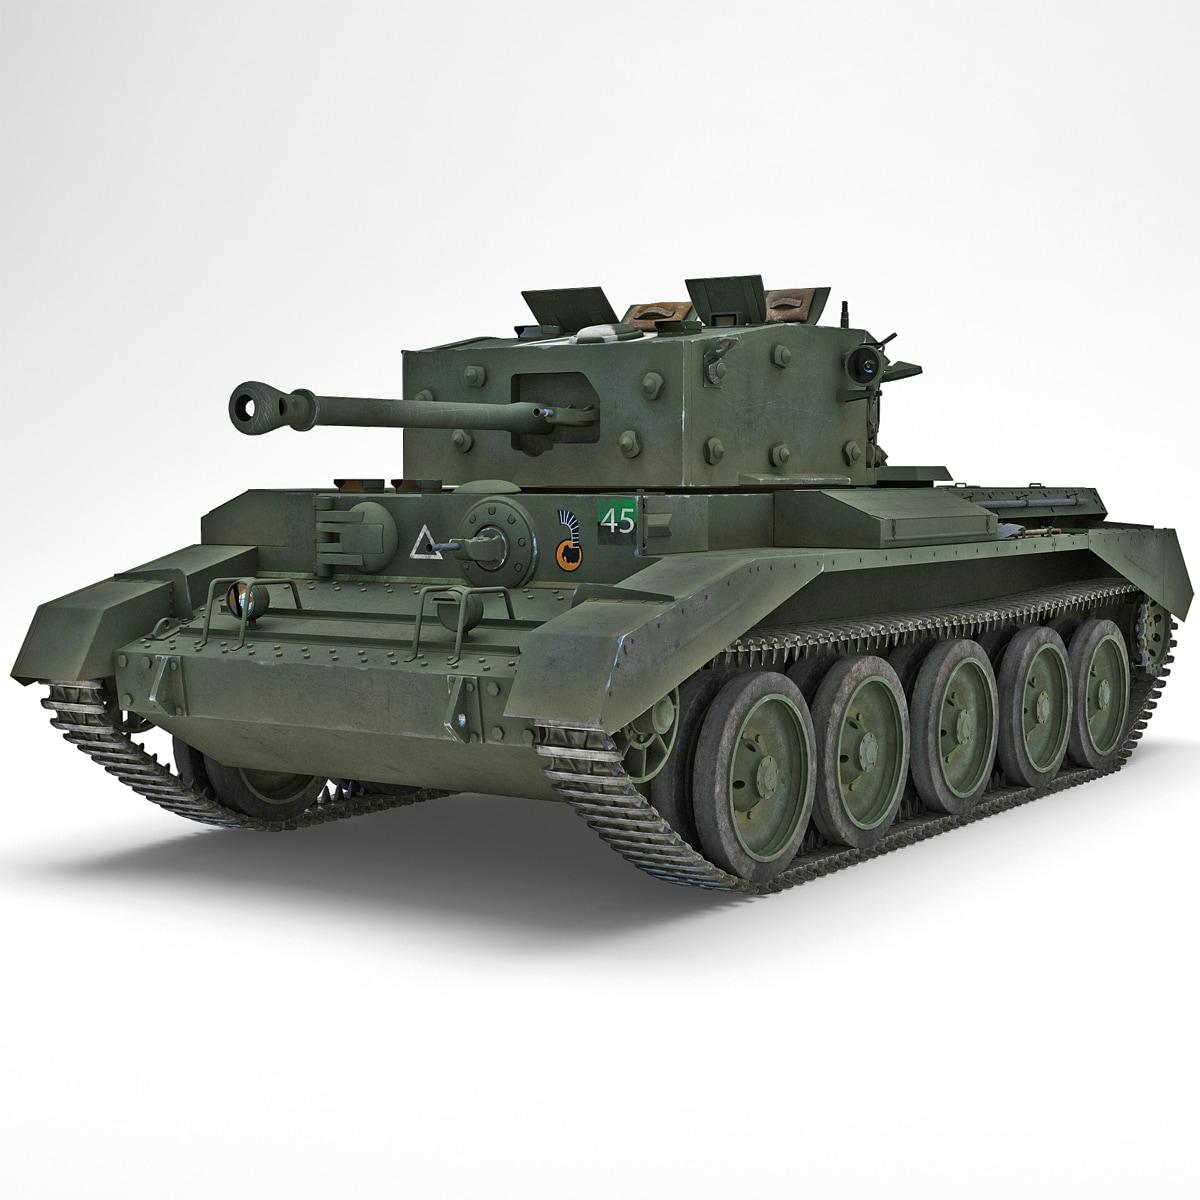 Britain Cruiser WWII Tank Mk VIII Cromwell Green_2.jpg